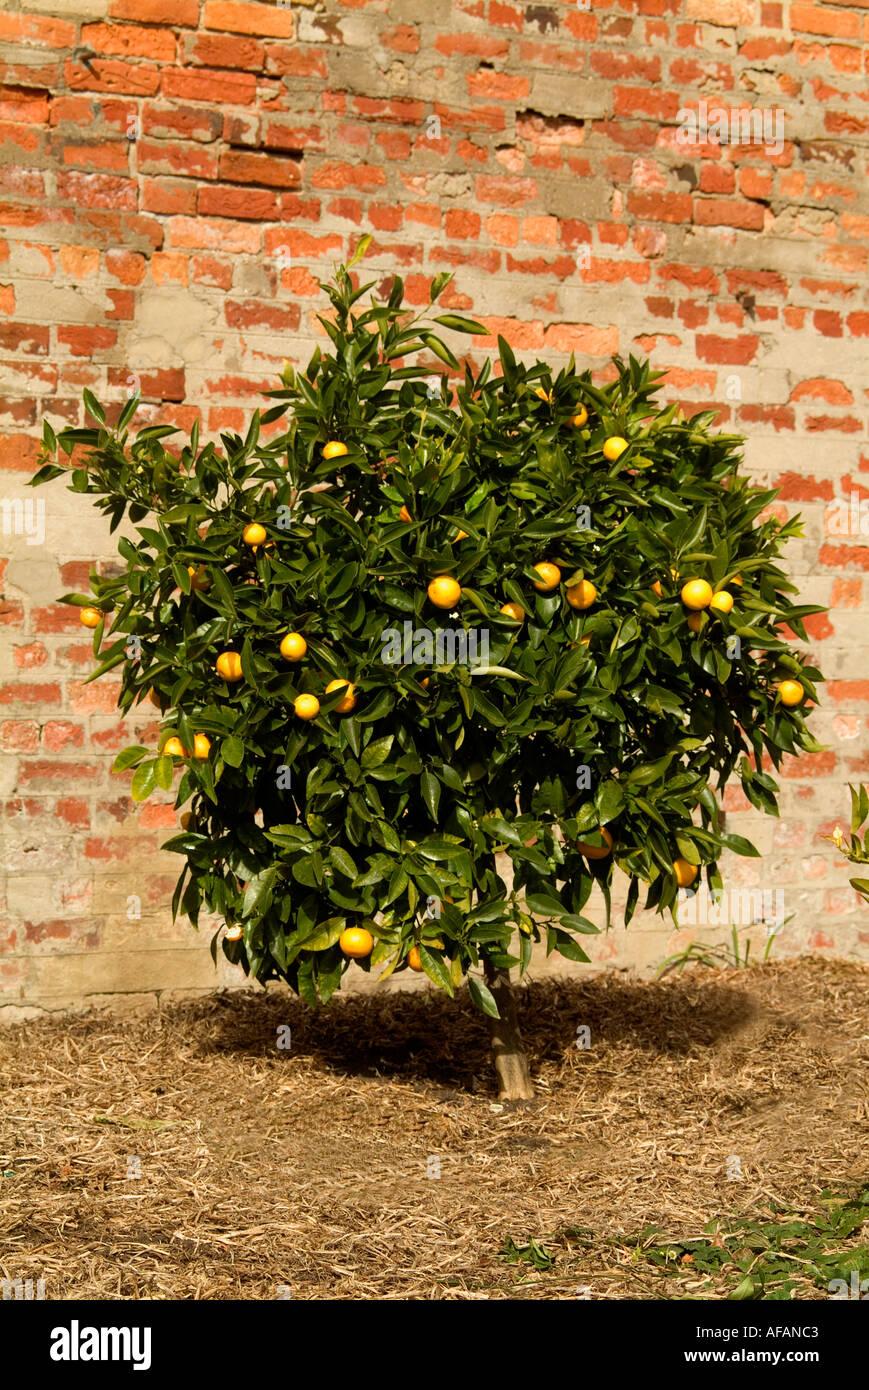 A tangelo citrus tree a cross between grapefruit and mandarin against a warm brick wall - Stock Image